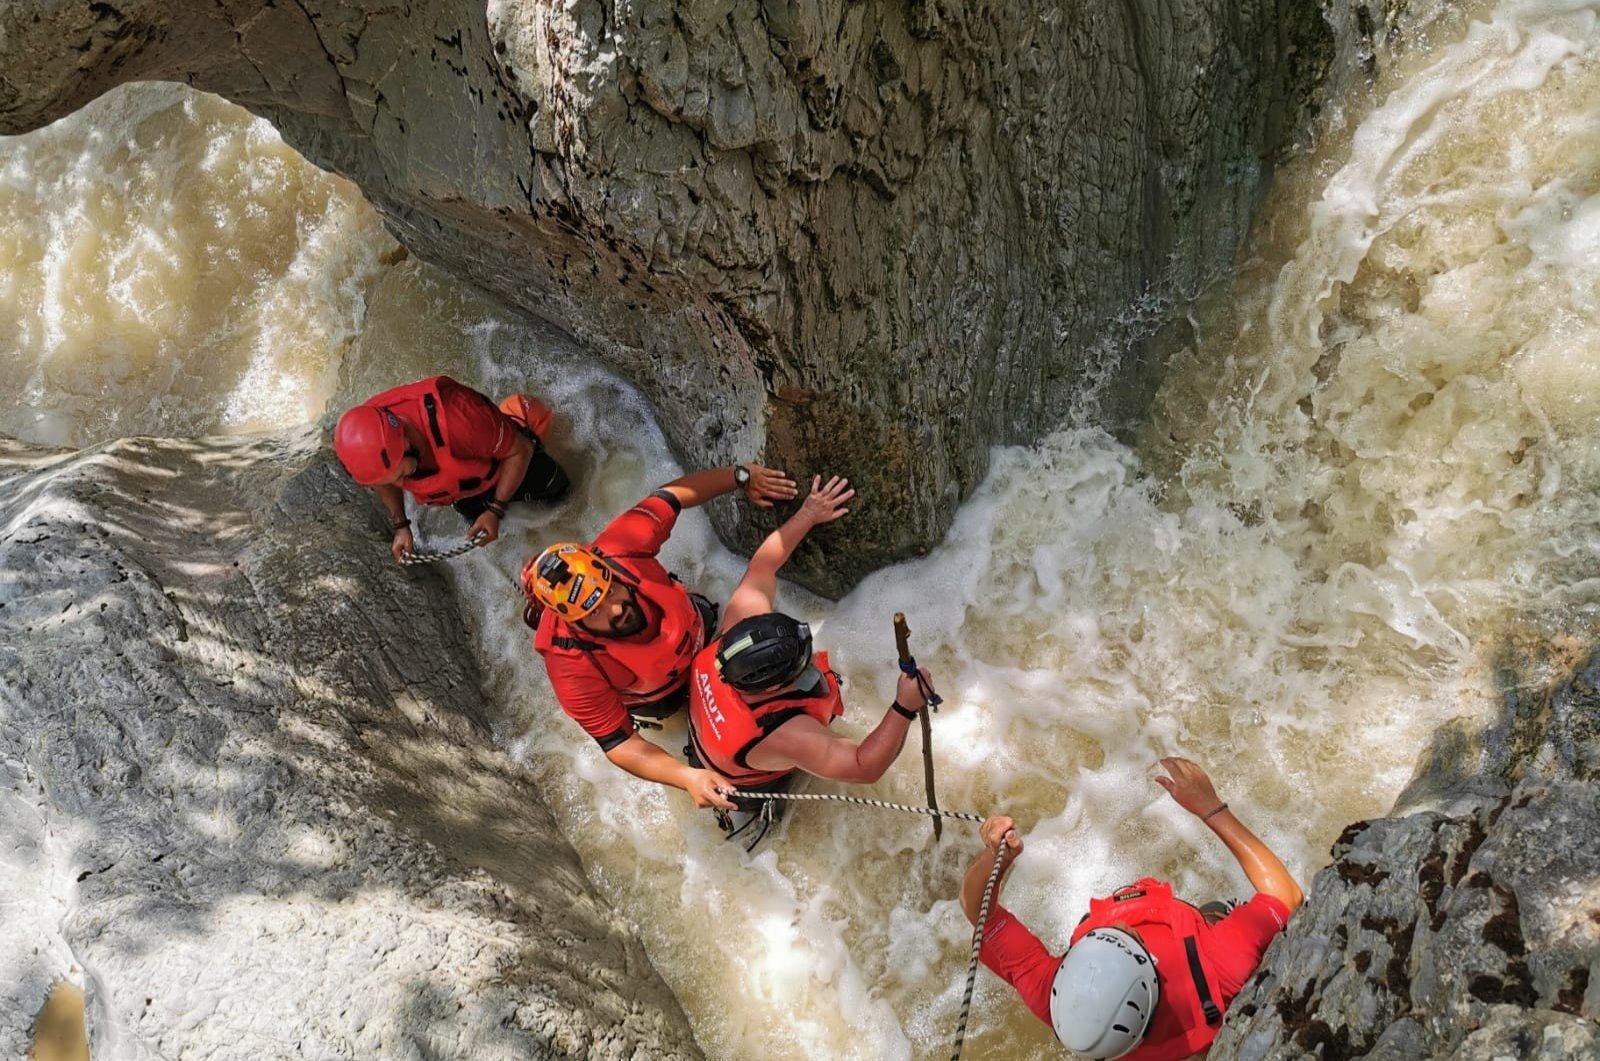 Search and rescue crews comb a river to find Derya Bilen, in Bursa, Turkey, June 24, 2020. (İHA Photo)